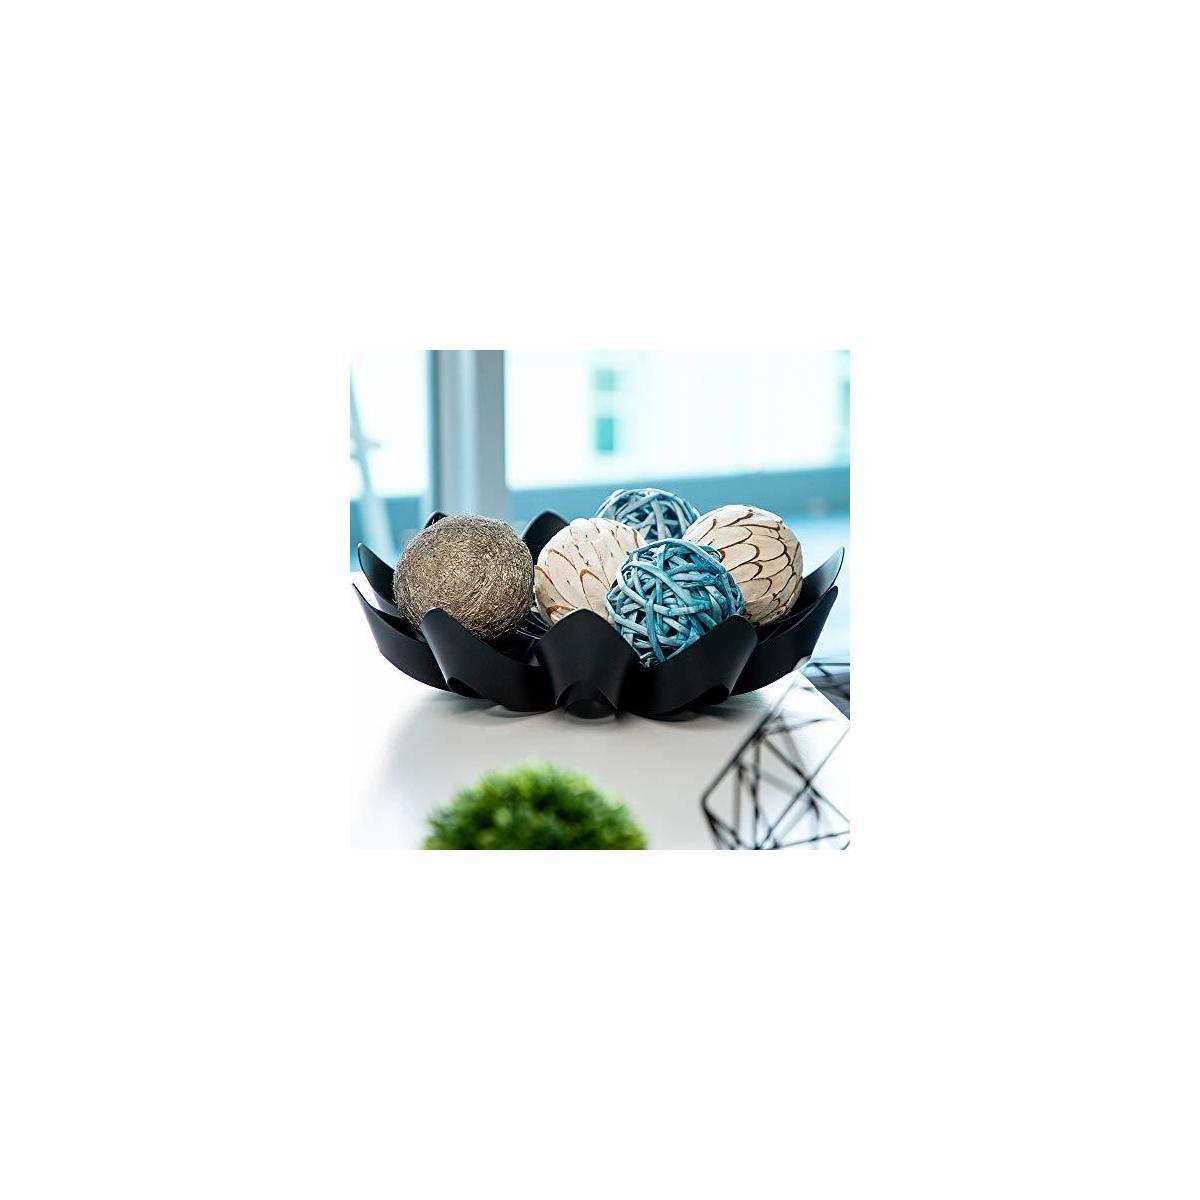 éscu Modern Fruit Bowl for Kitchen Table and Countertop Decor - Black, 15